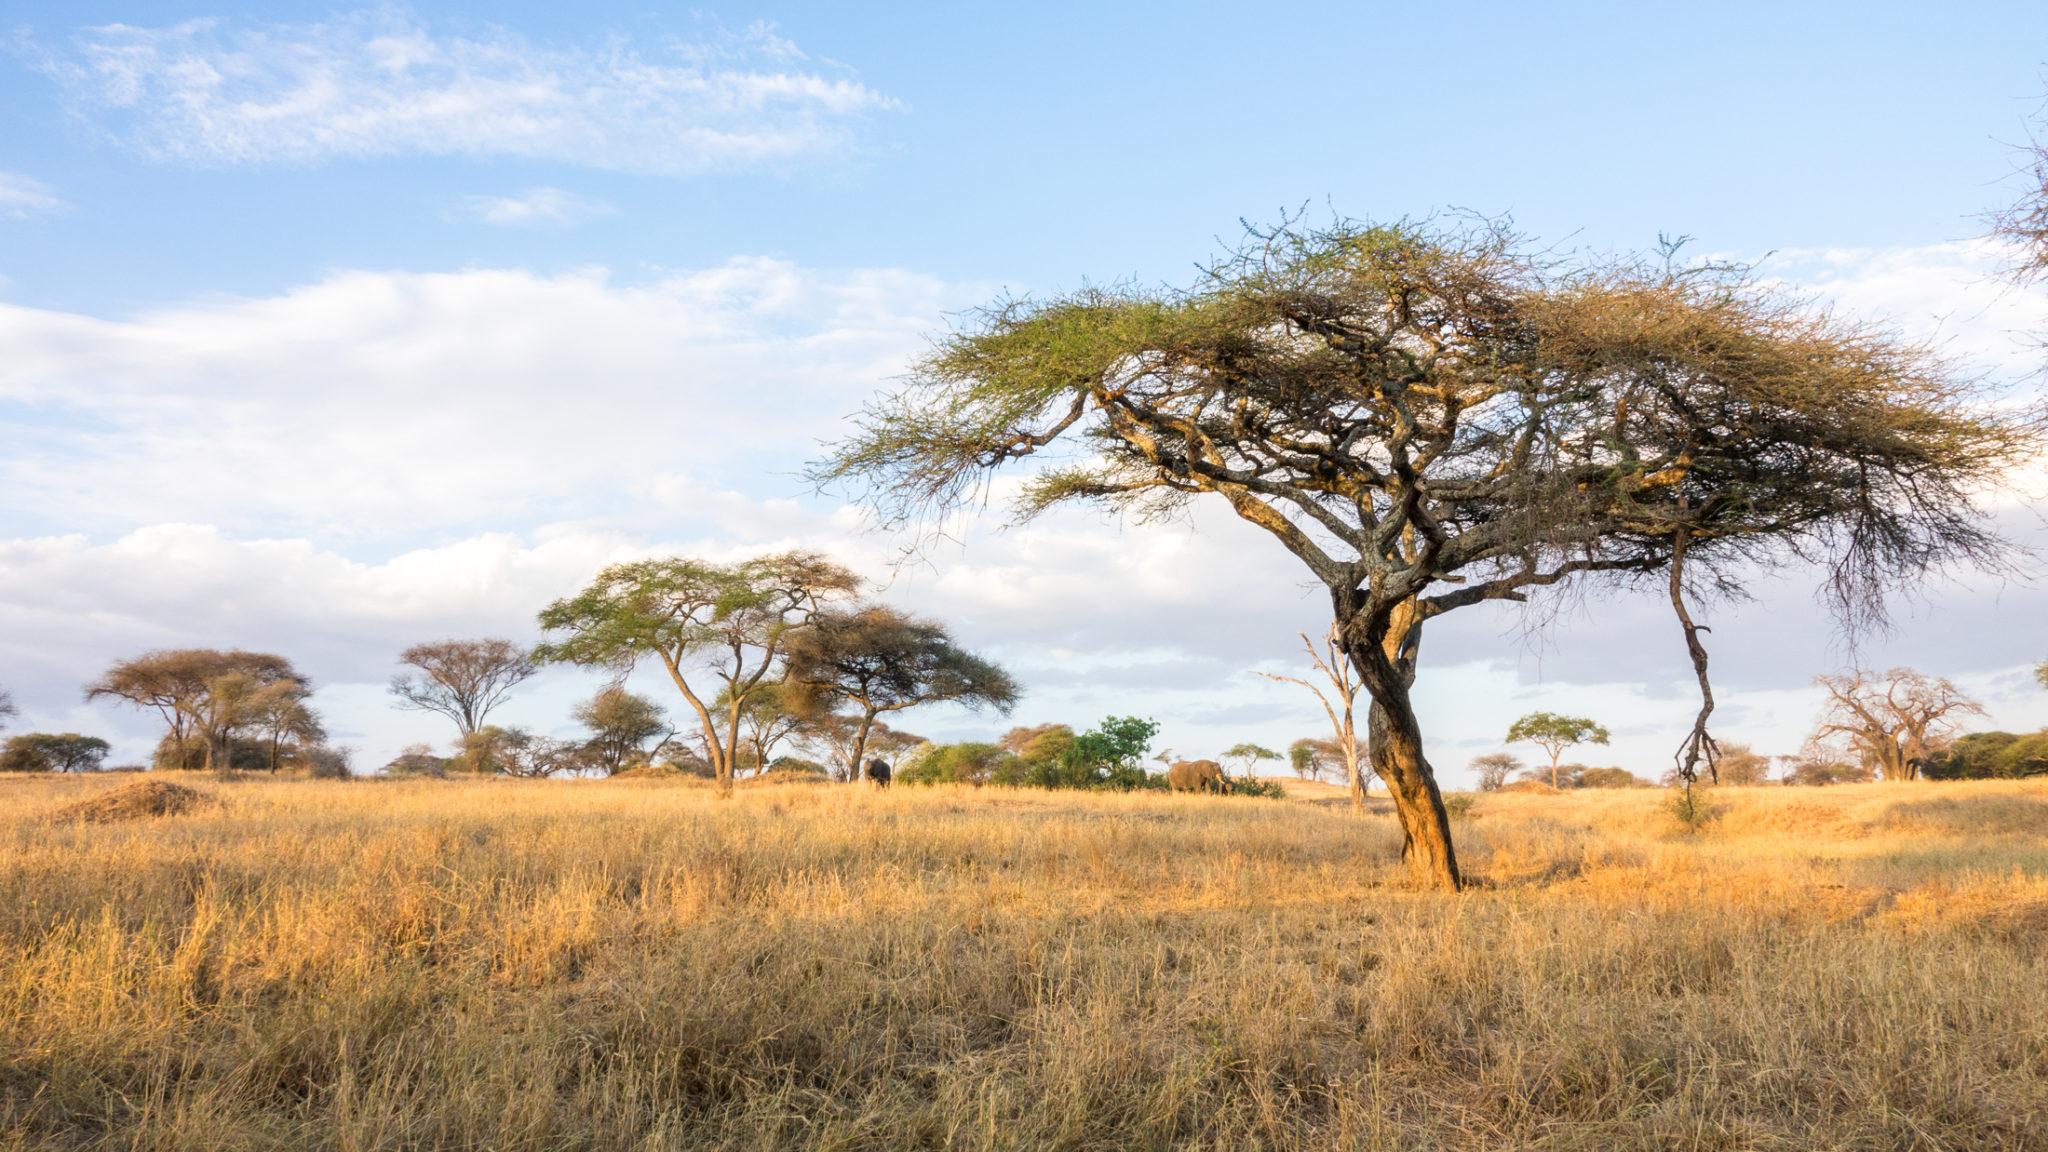 Elefanten im Sonnenuntergang im Tarangire Nationalpark, Tansania